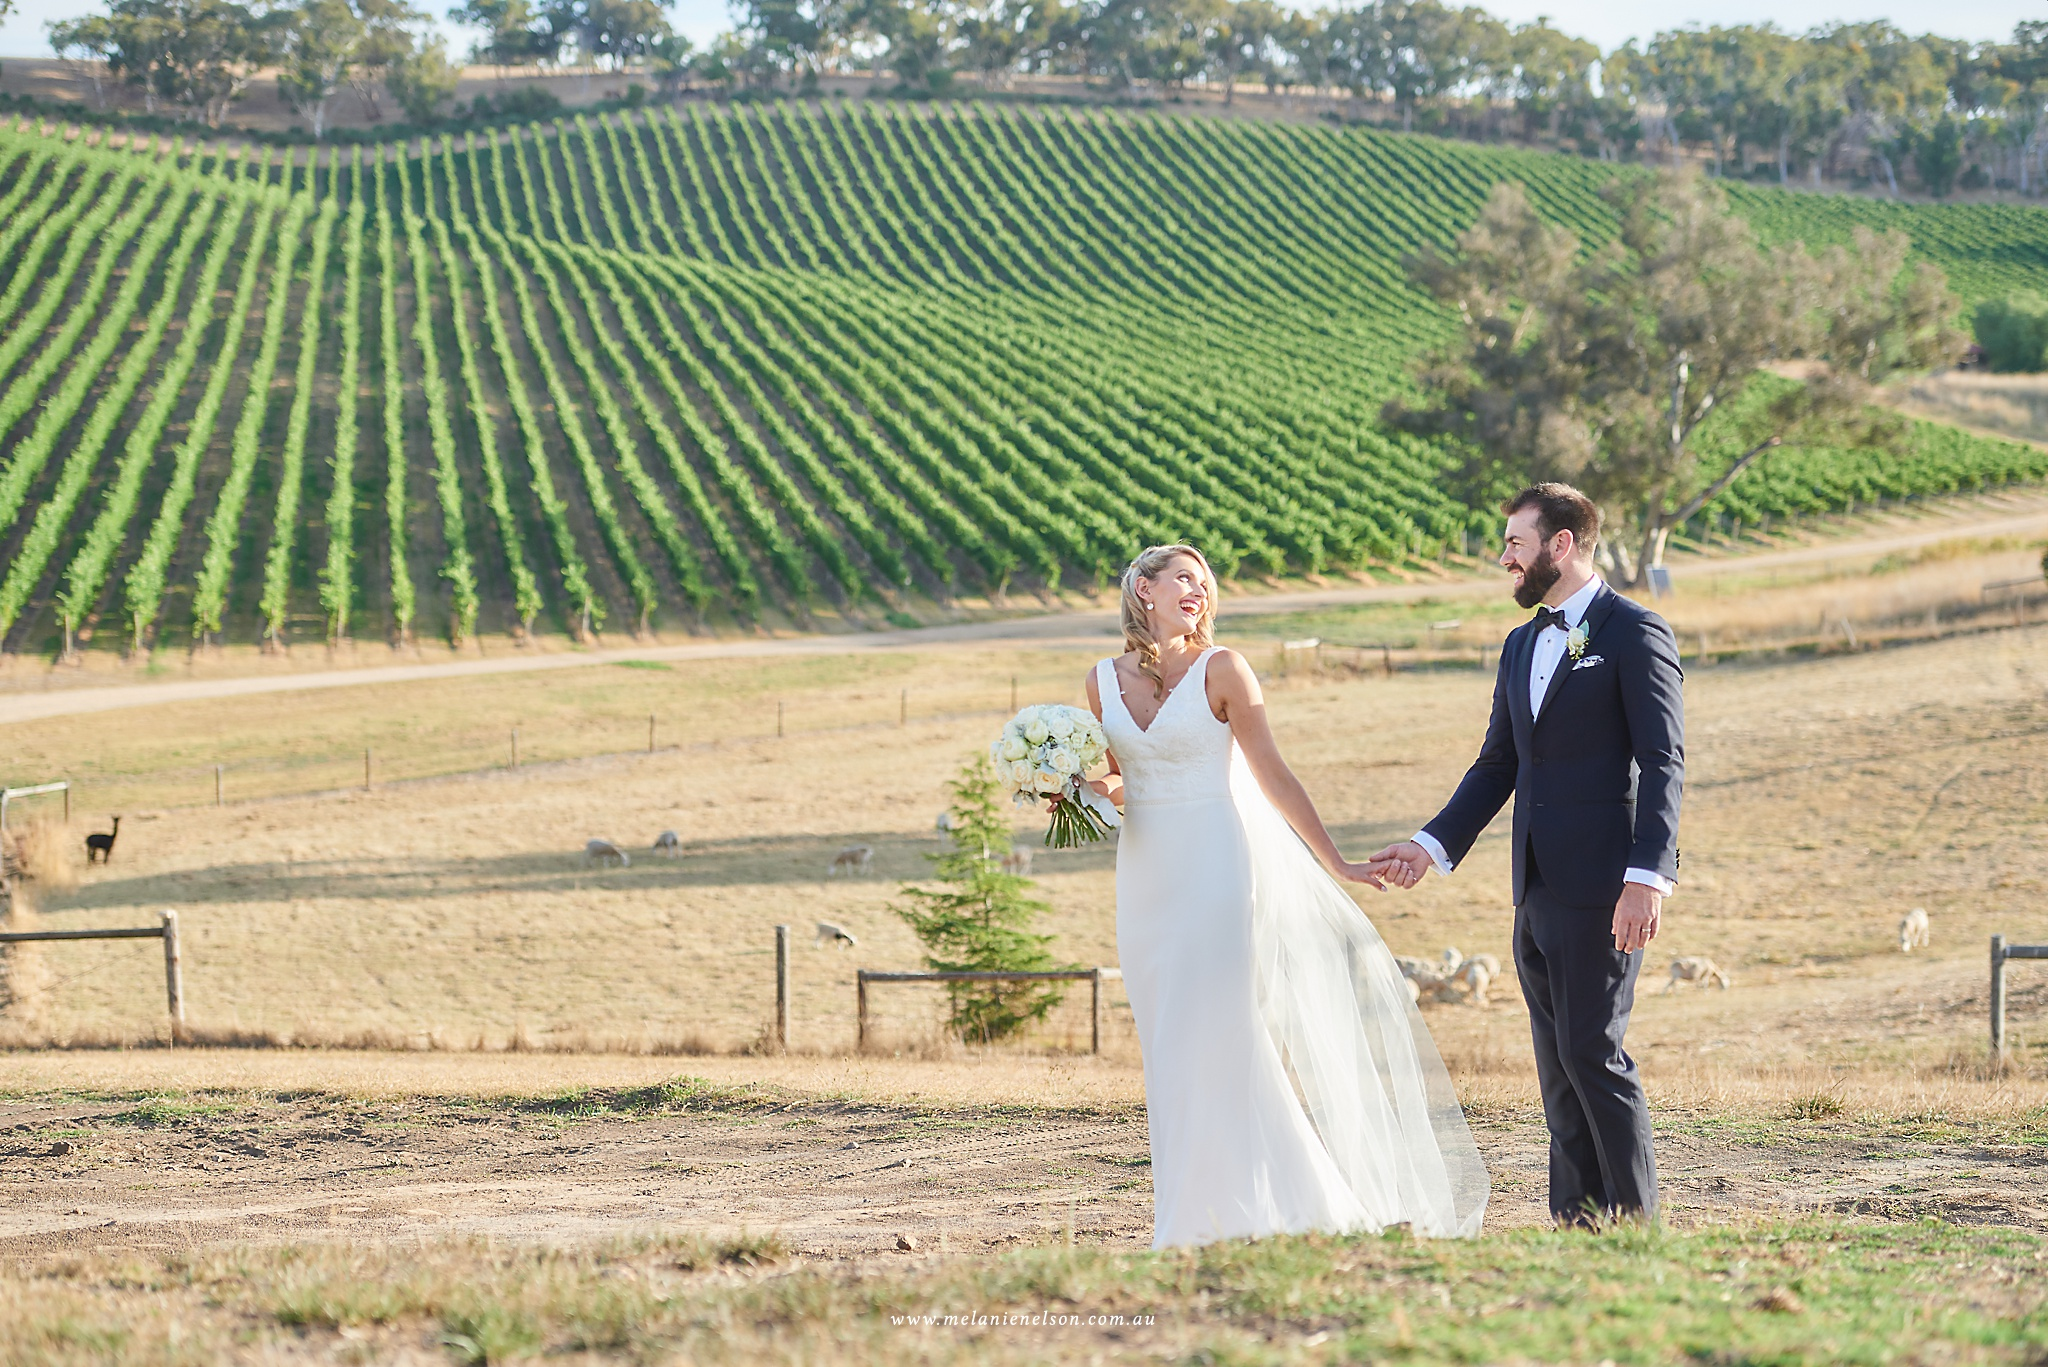 longview_vineyard_wedding_0058.jpg